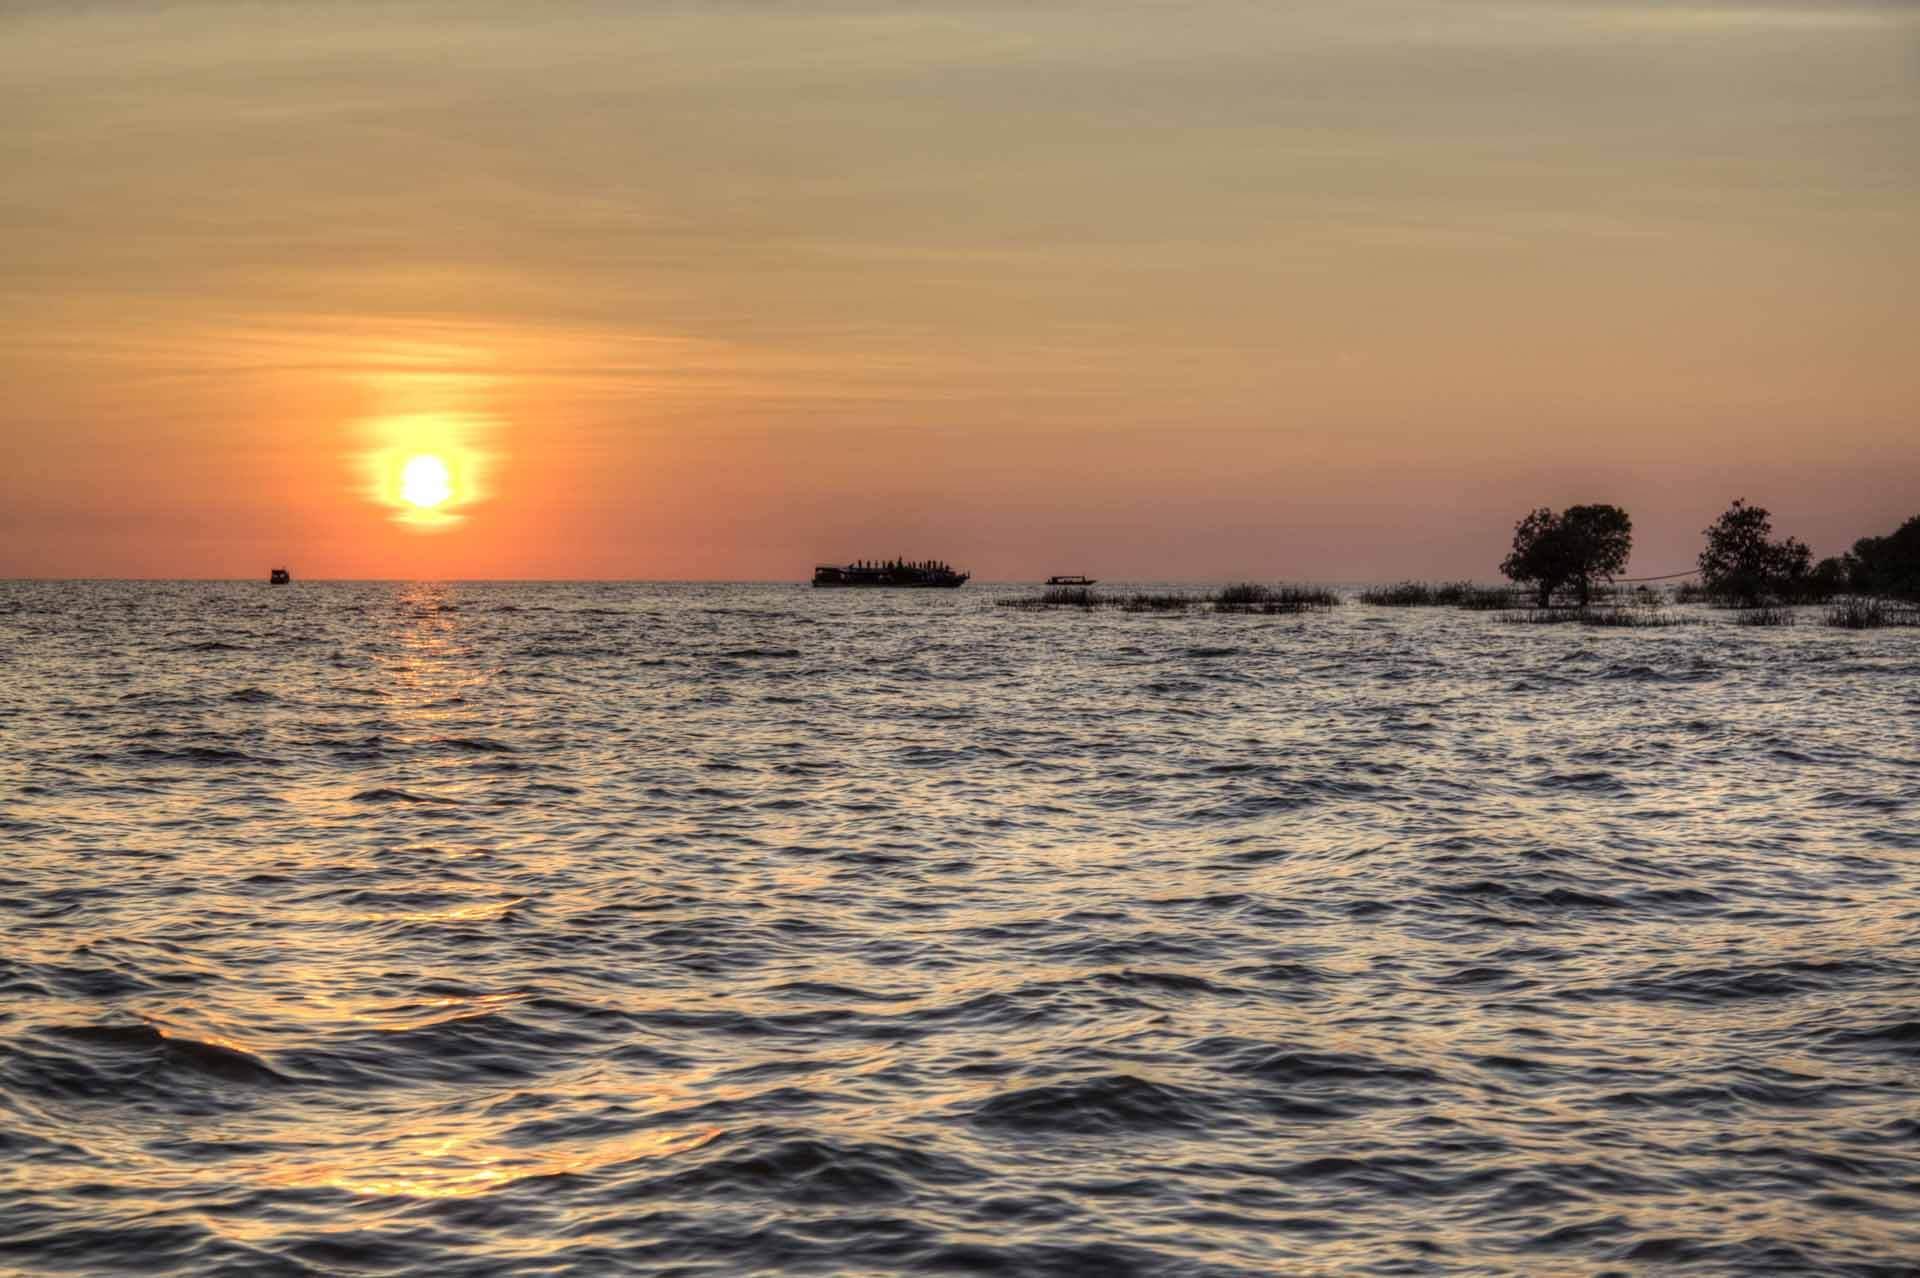 Tonle-Sap-See in Kambodscha, Region Siem Reap